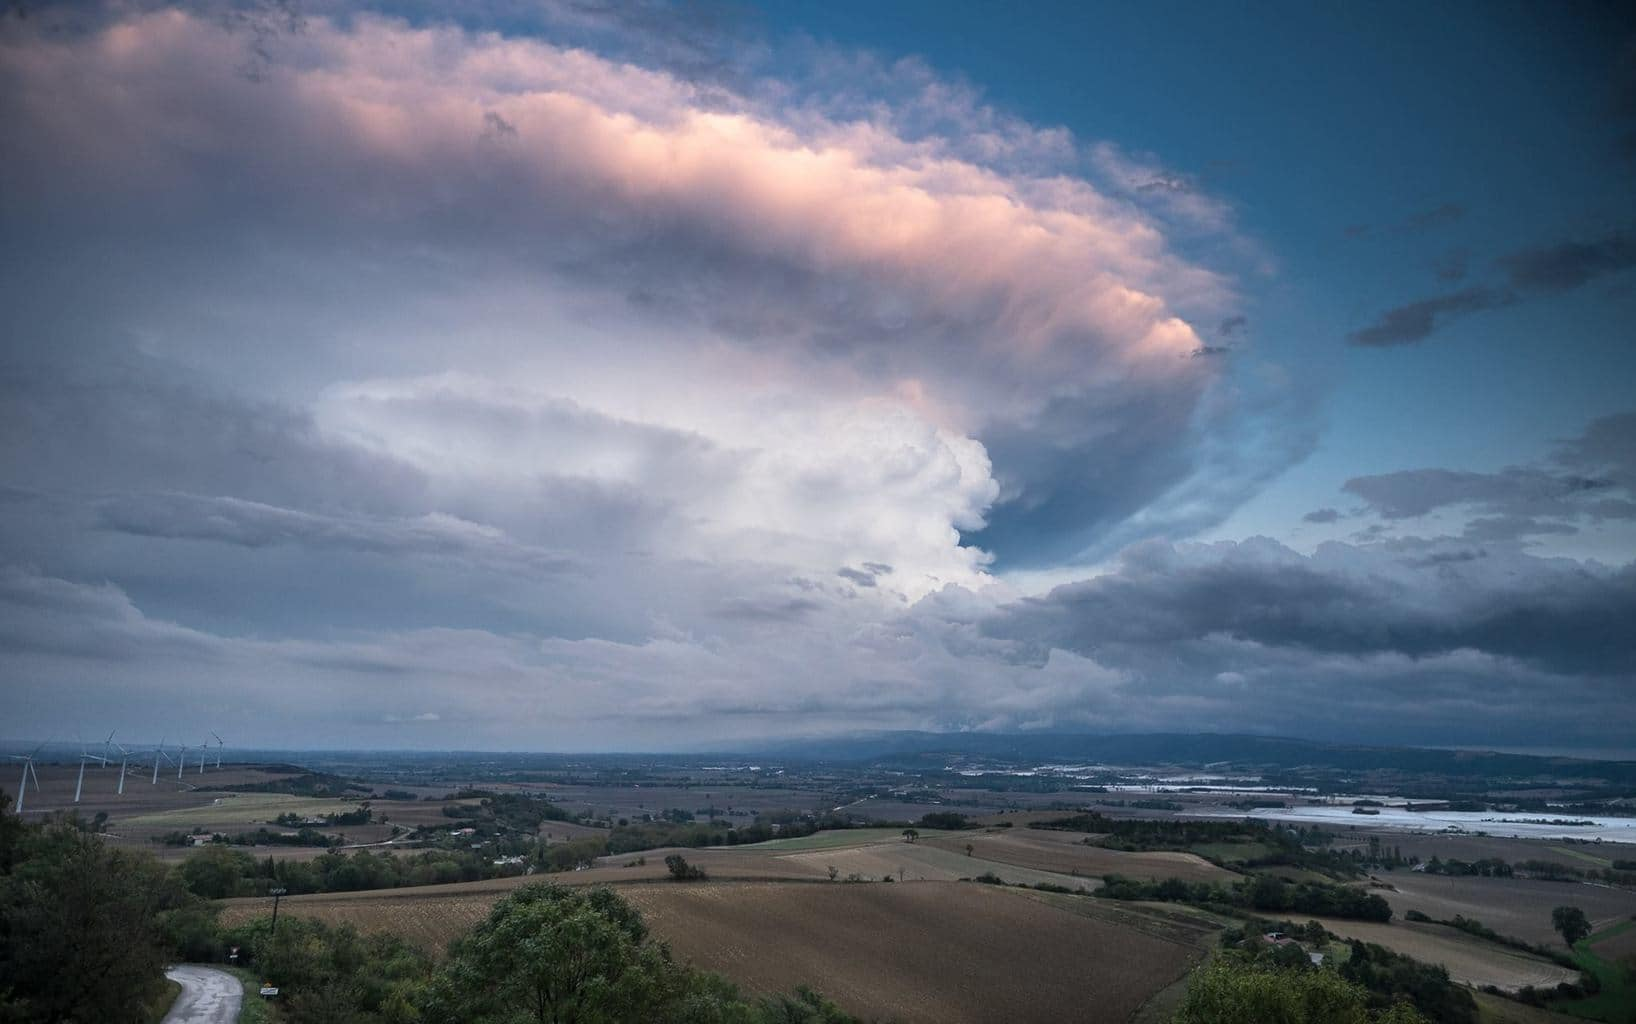 Supercell near Saint Felix du Lauragais, France (09/10/2014)